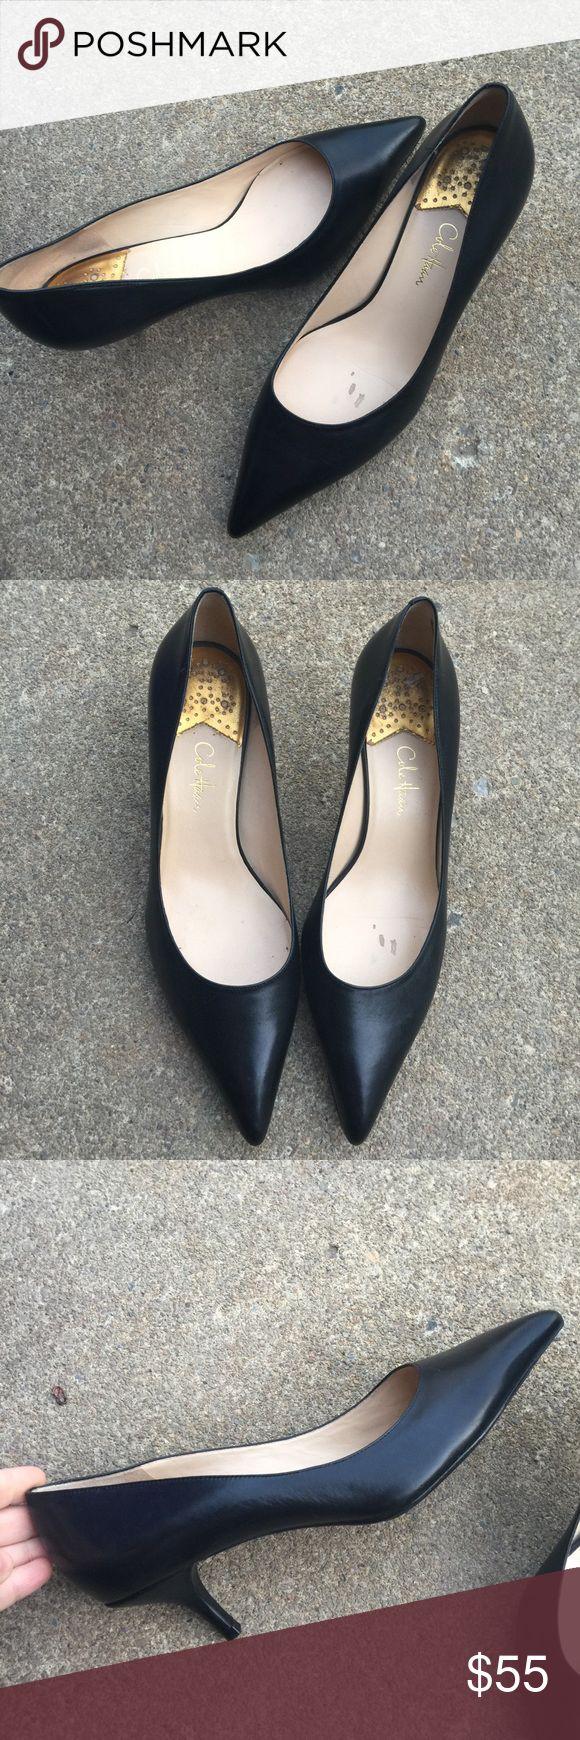 Women's Cole Haan Black Leather Pumps Heels 9B Women's Cole Haan Black Leather Pumps Heels 9B Nike Air Technology  EUC Cole Haan Shoes Heels